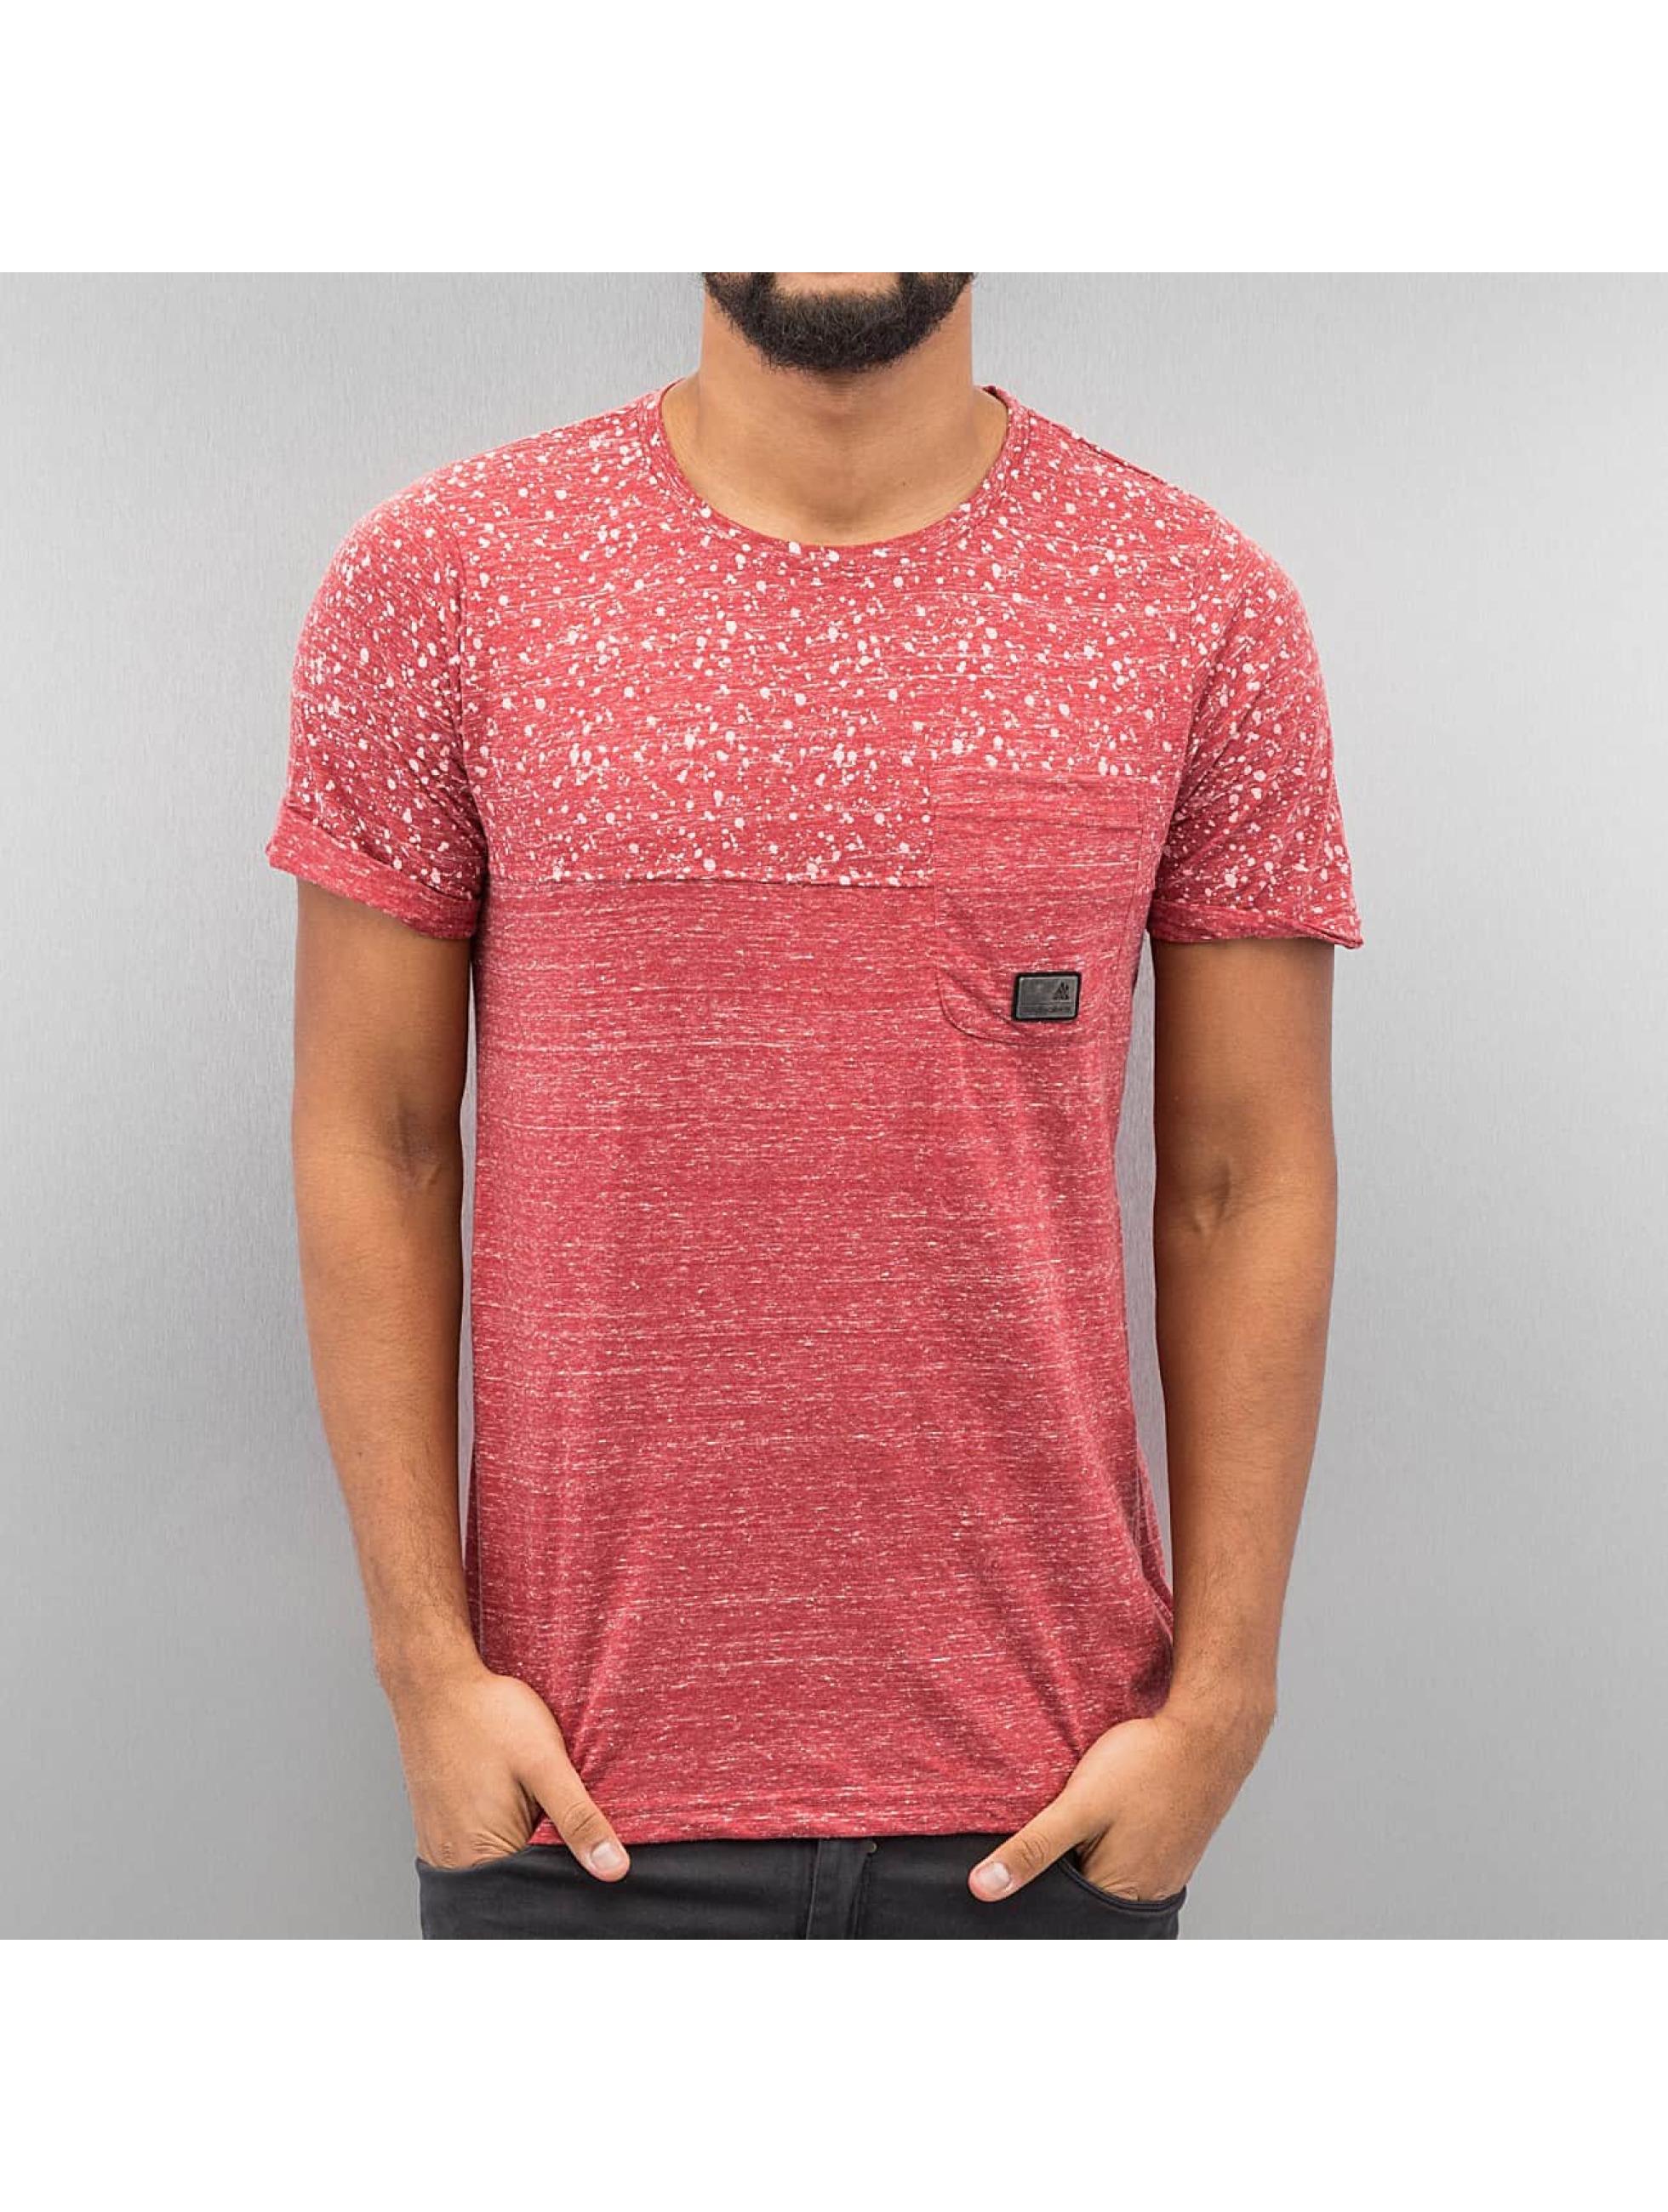 Alife & Kickin T-skjorter Vin red